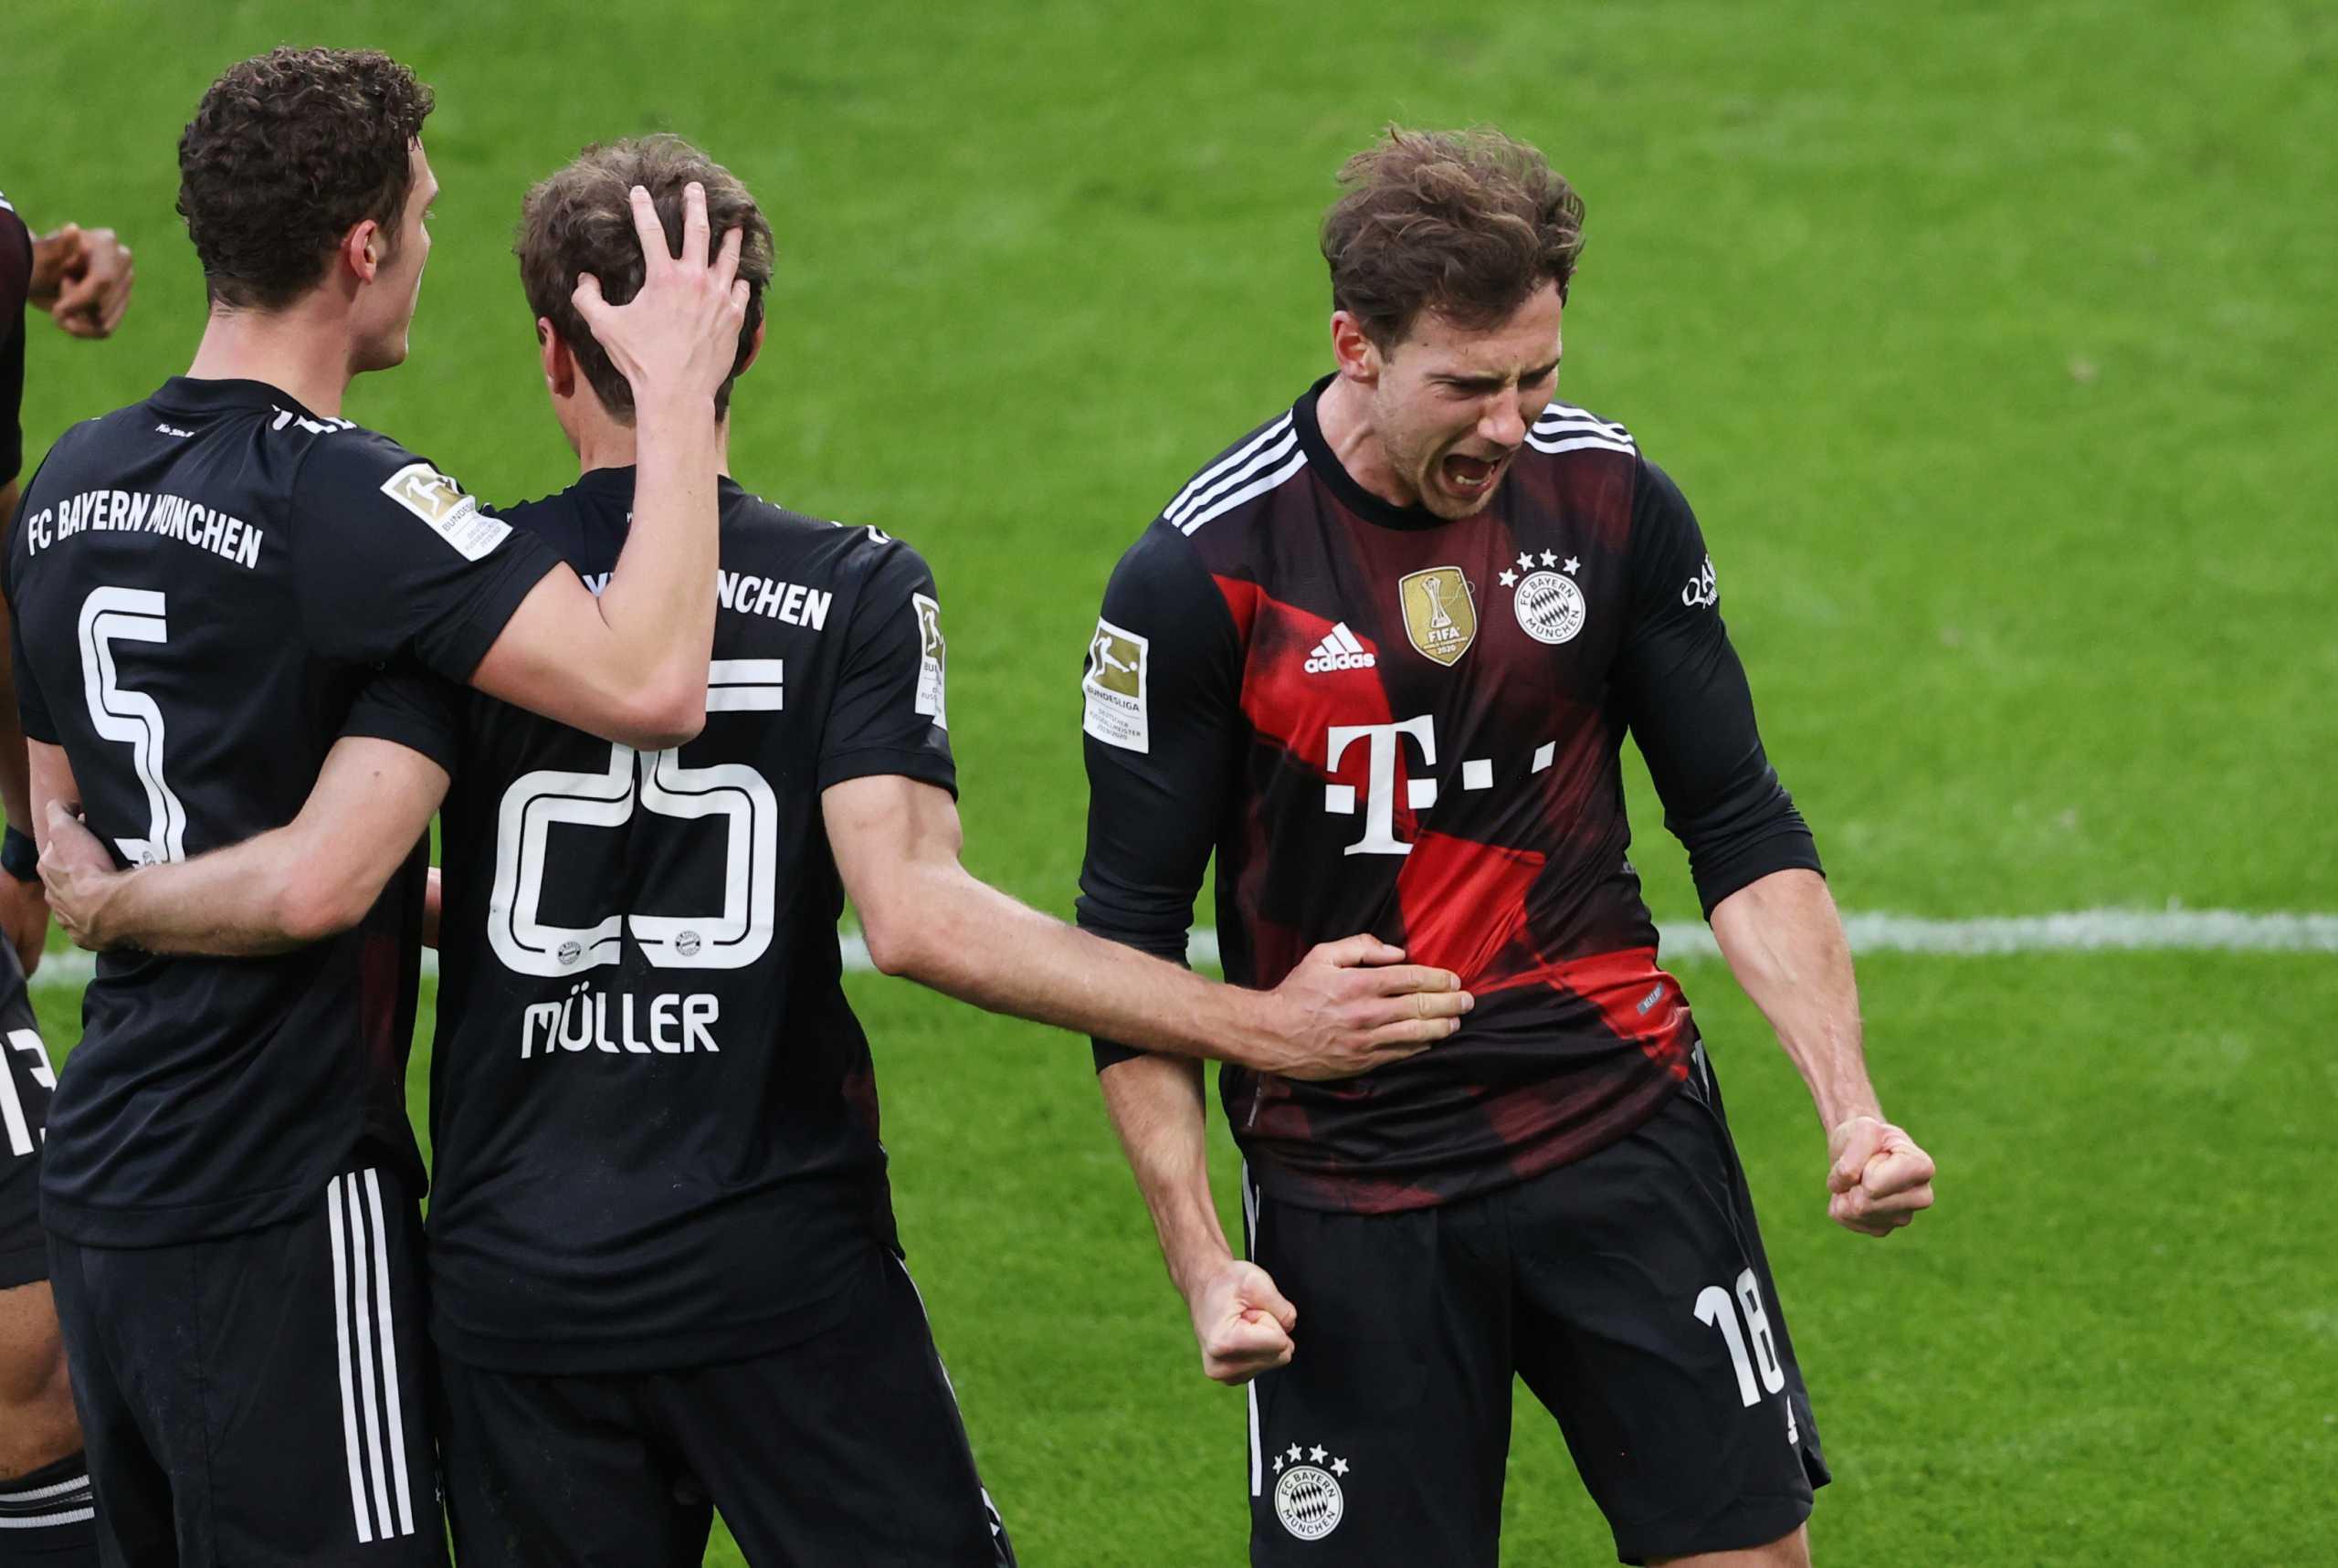 Bundesliga: H Μπάγερν Μονάχου πήρε το ντέρμπι κορυφής και χωρίς Λεβαντόφσκι (video)